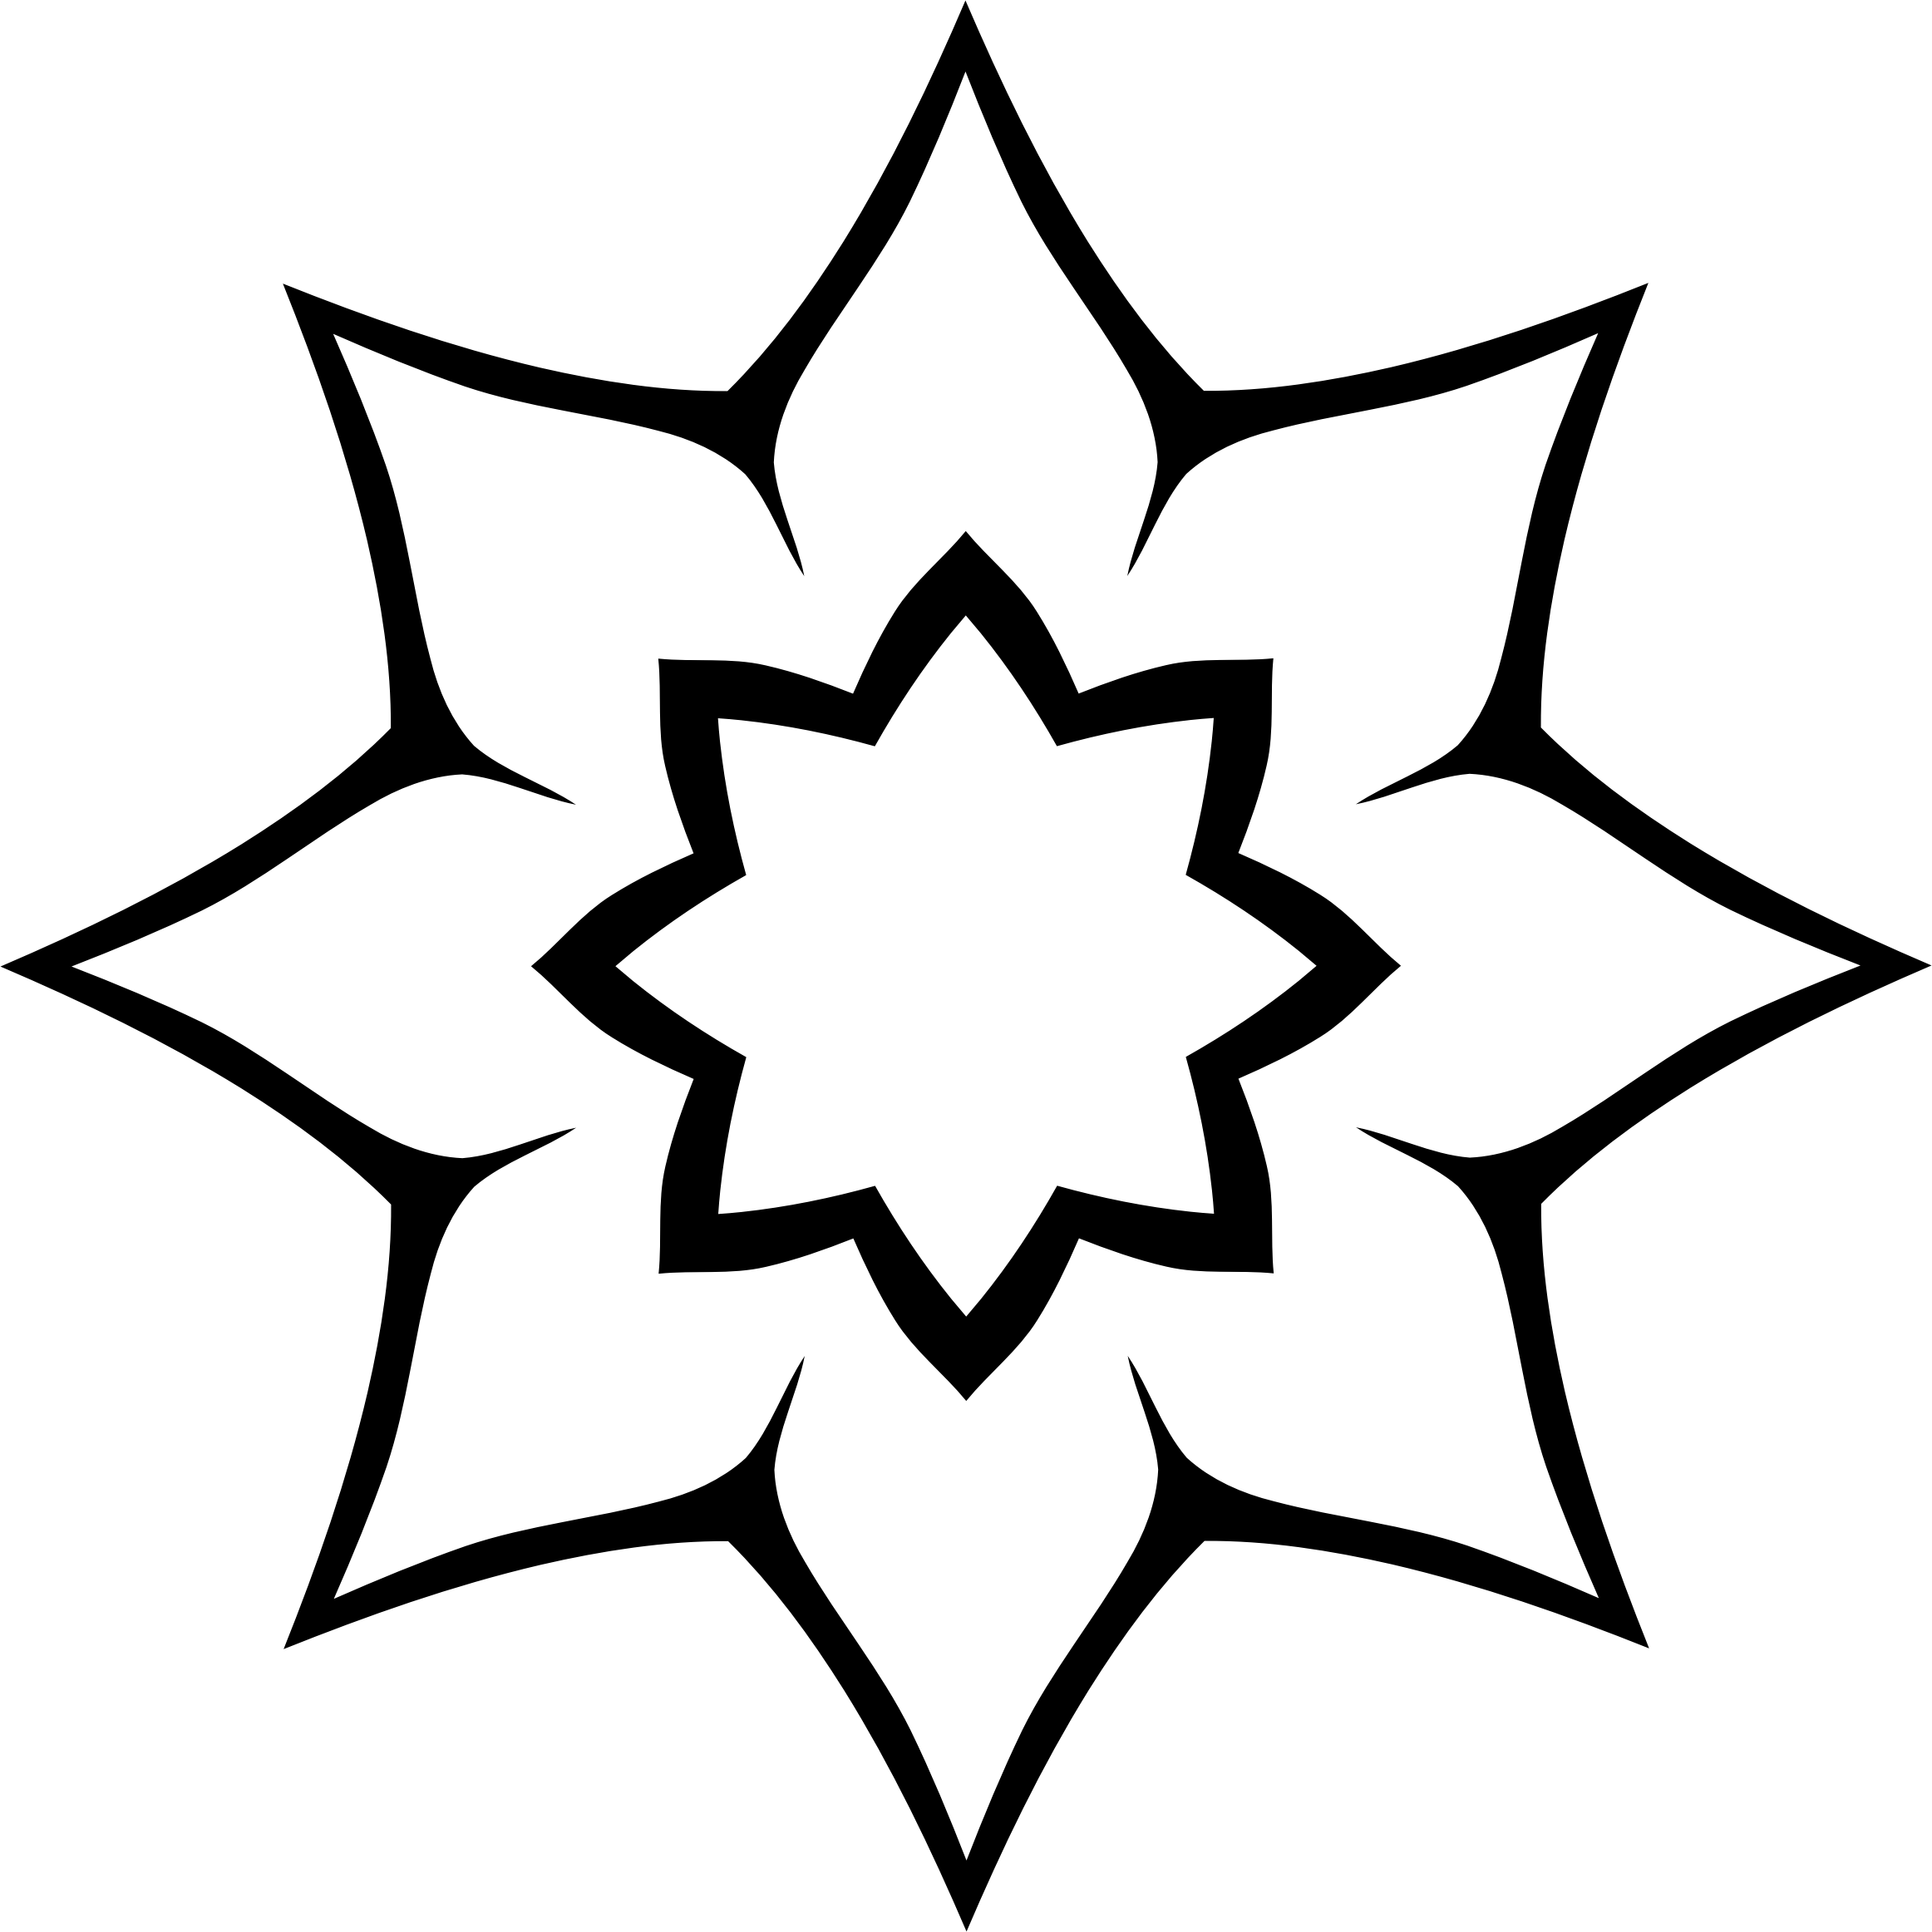 2324x2324 Silhouette Clipart Flower